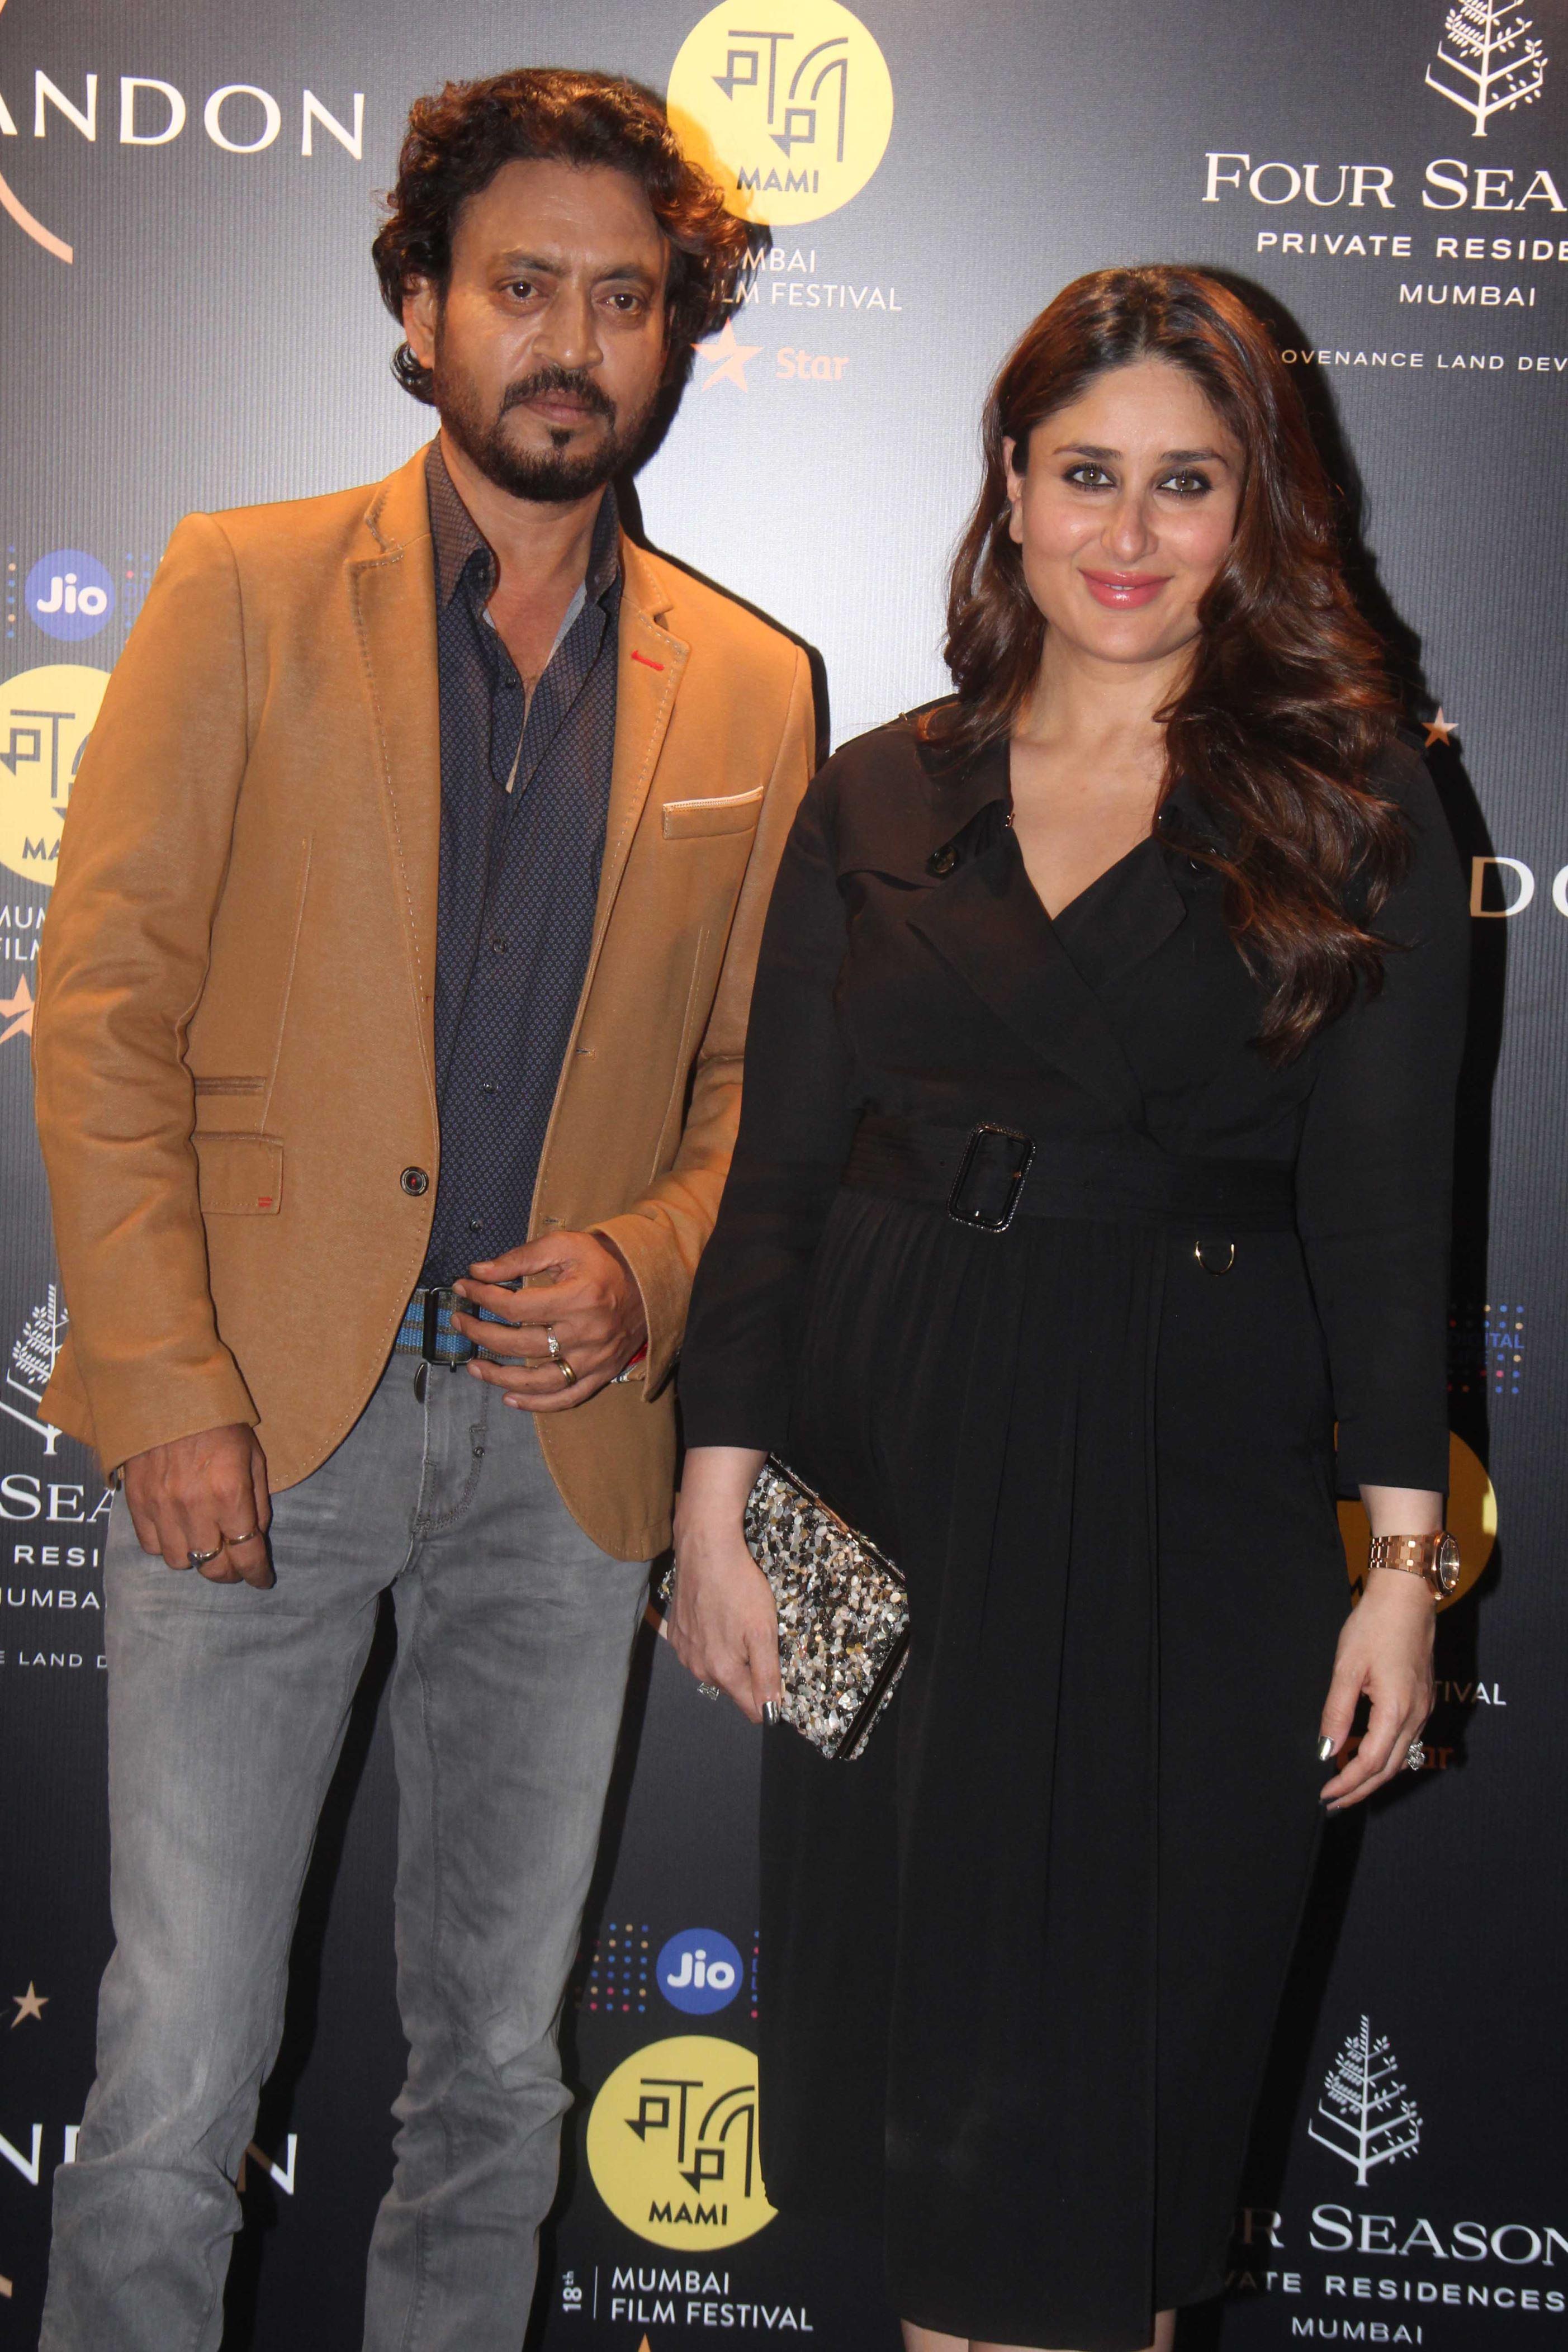 will irrfan romance kareena kapoor khan in hindi medium 2?